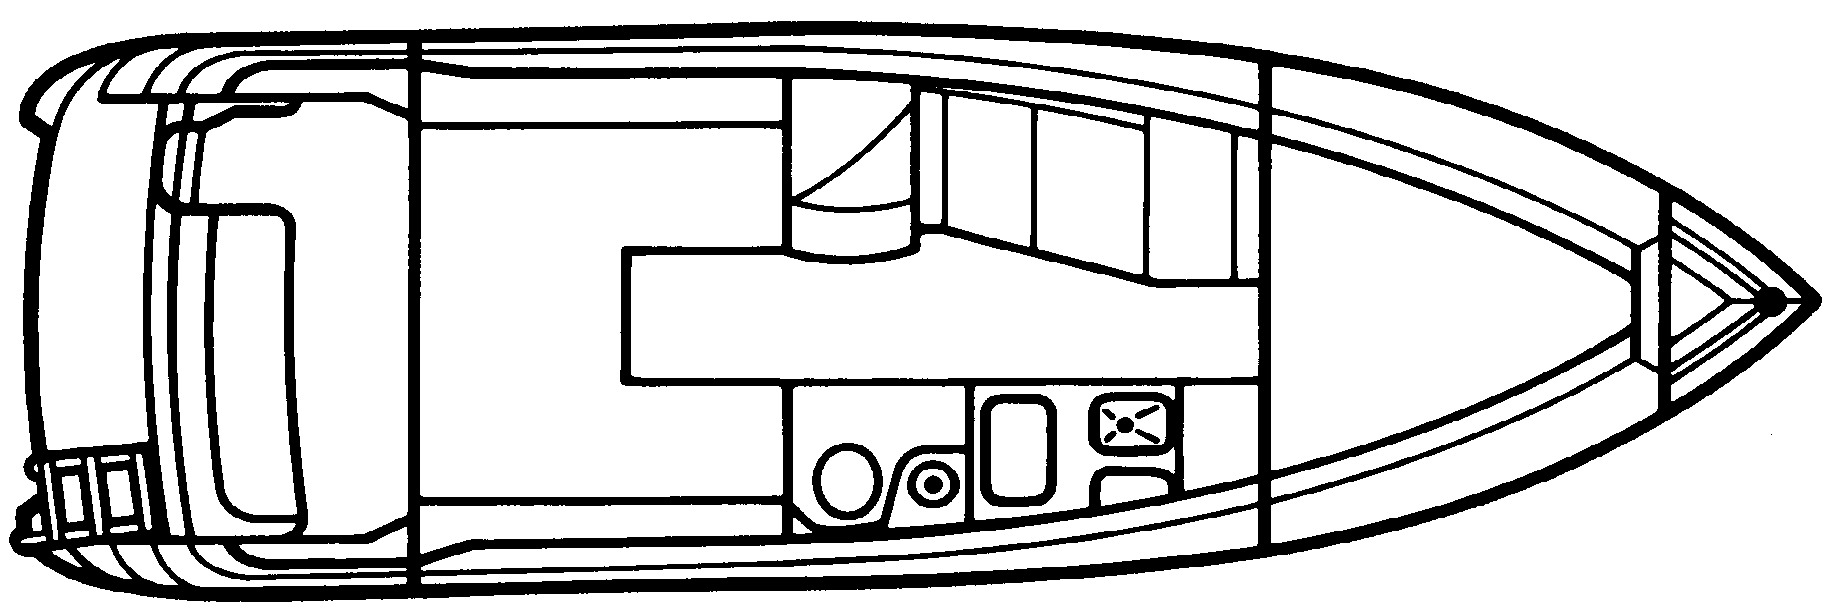 278 Vista Floor Plan 1